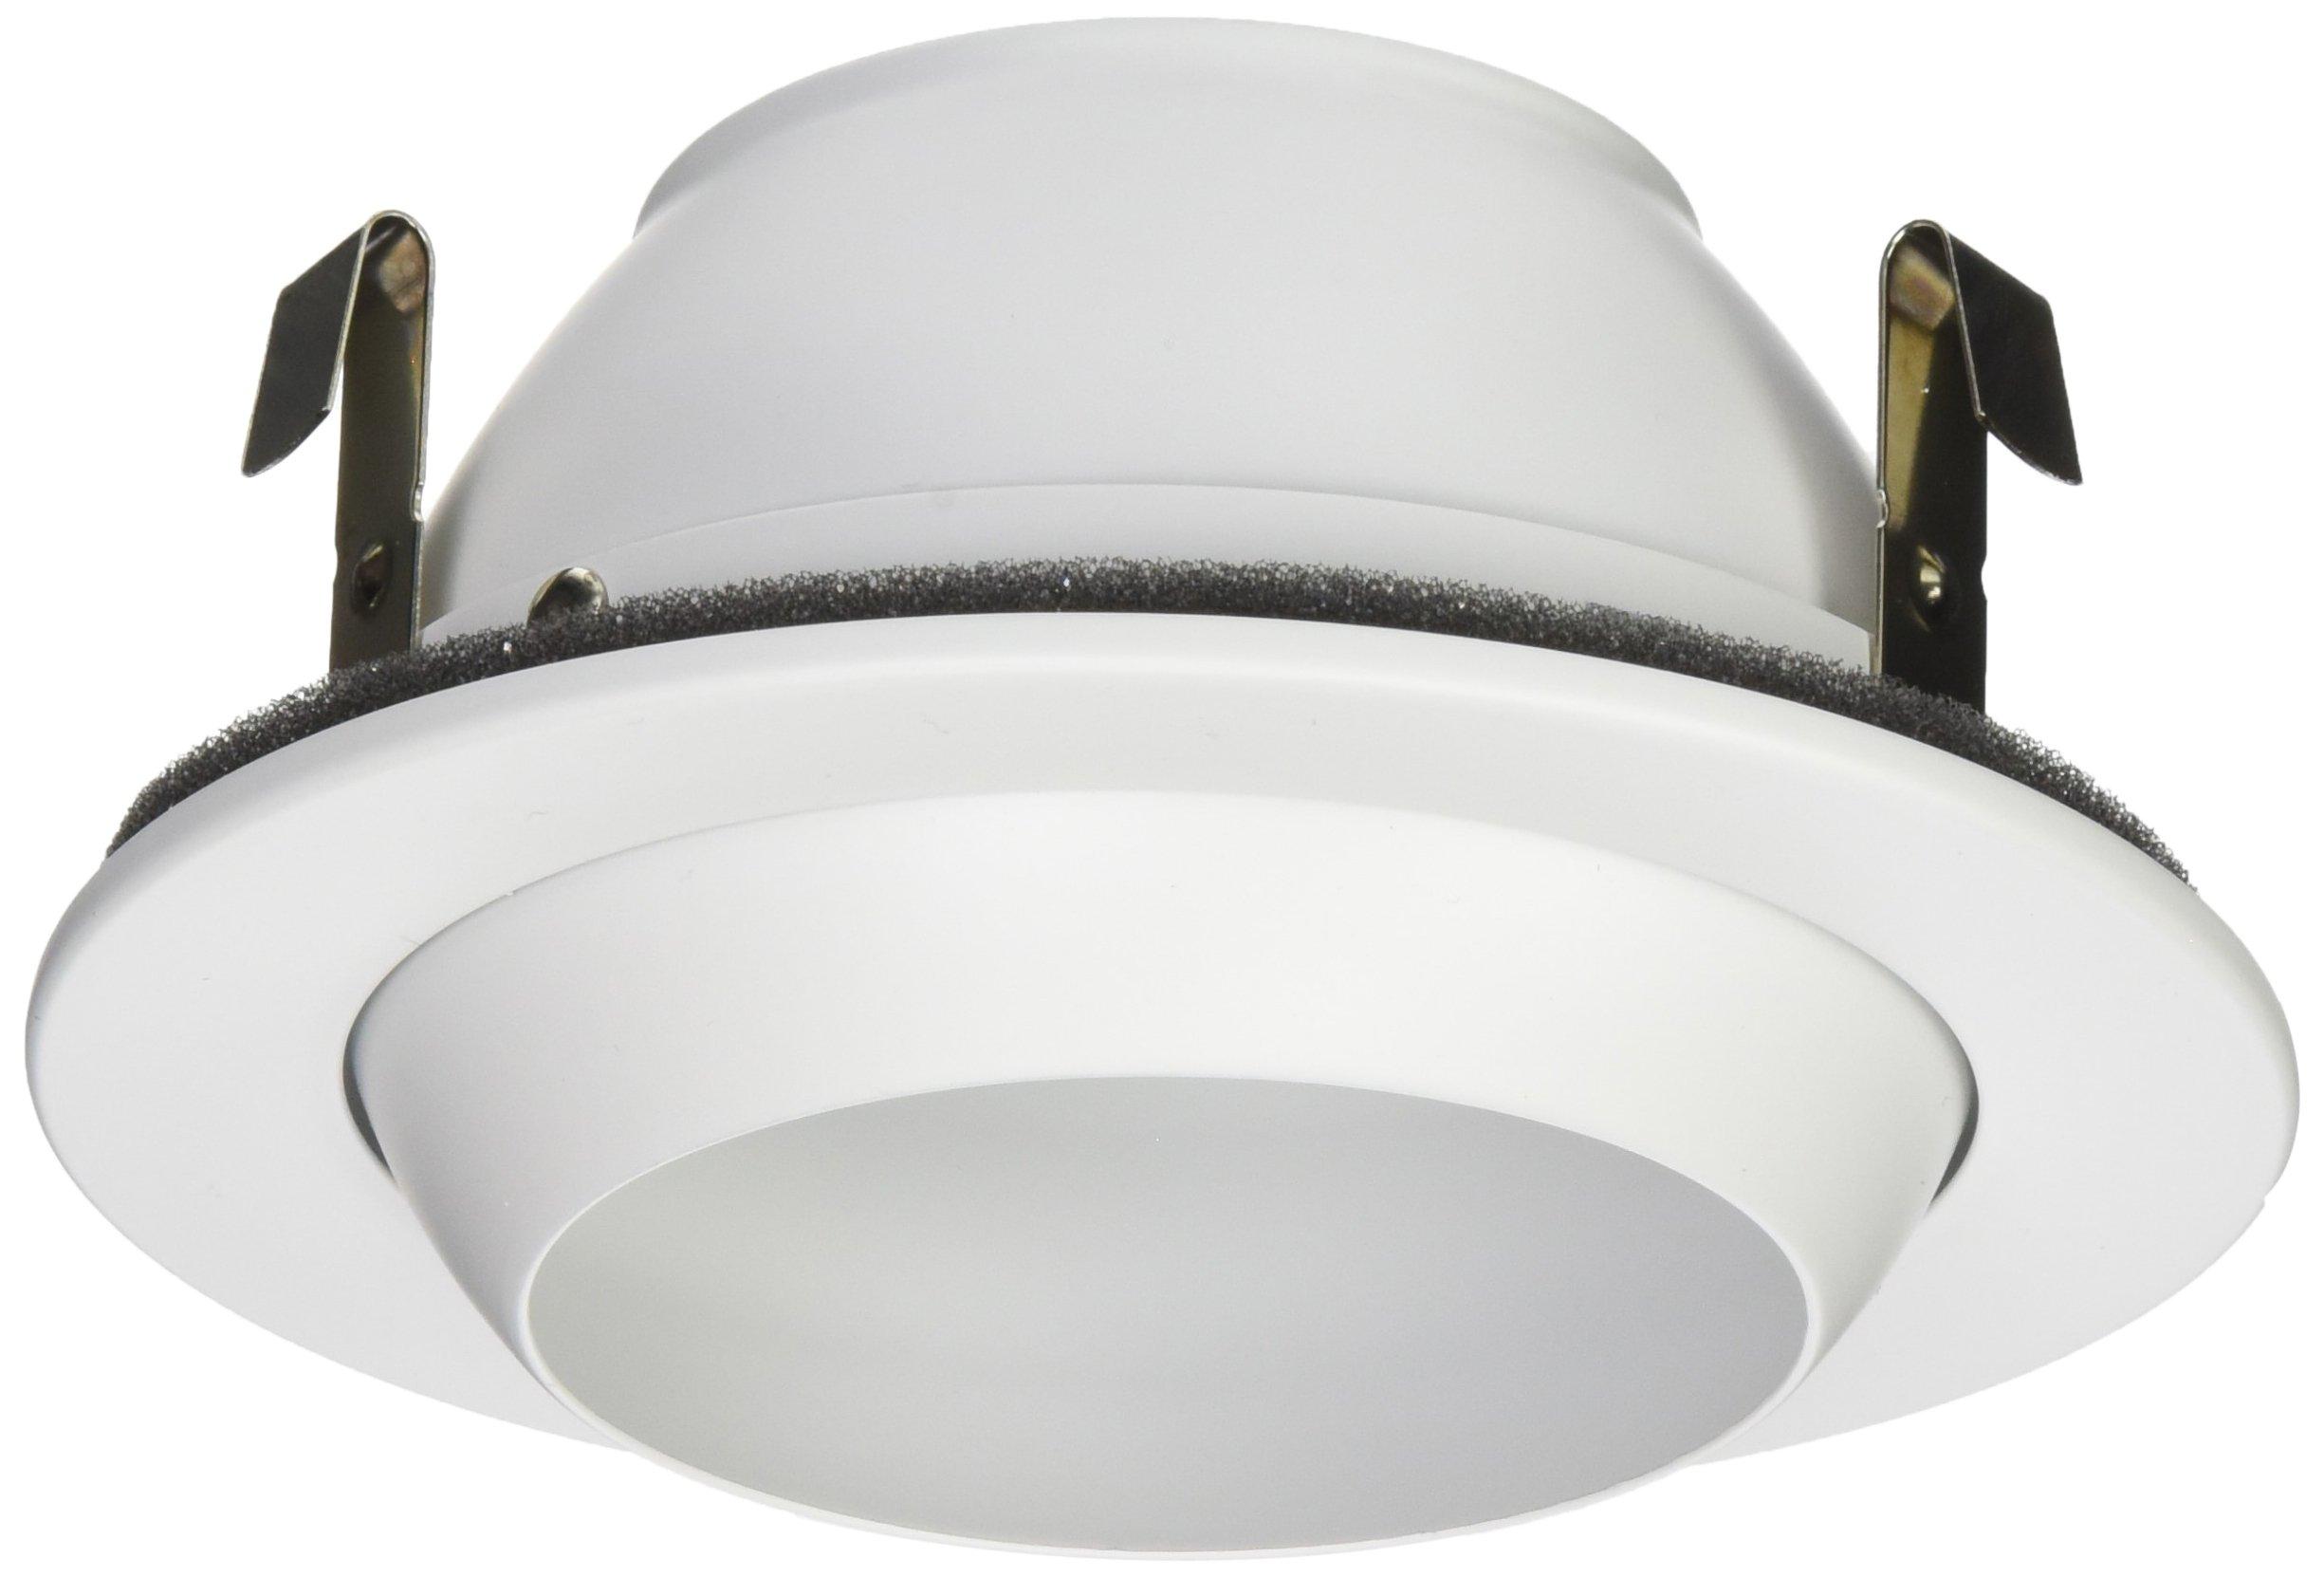 NICOR Lighting 4-Inch Adjustable Eyeball Recessed Trim, White (19506WH)